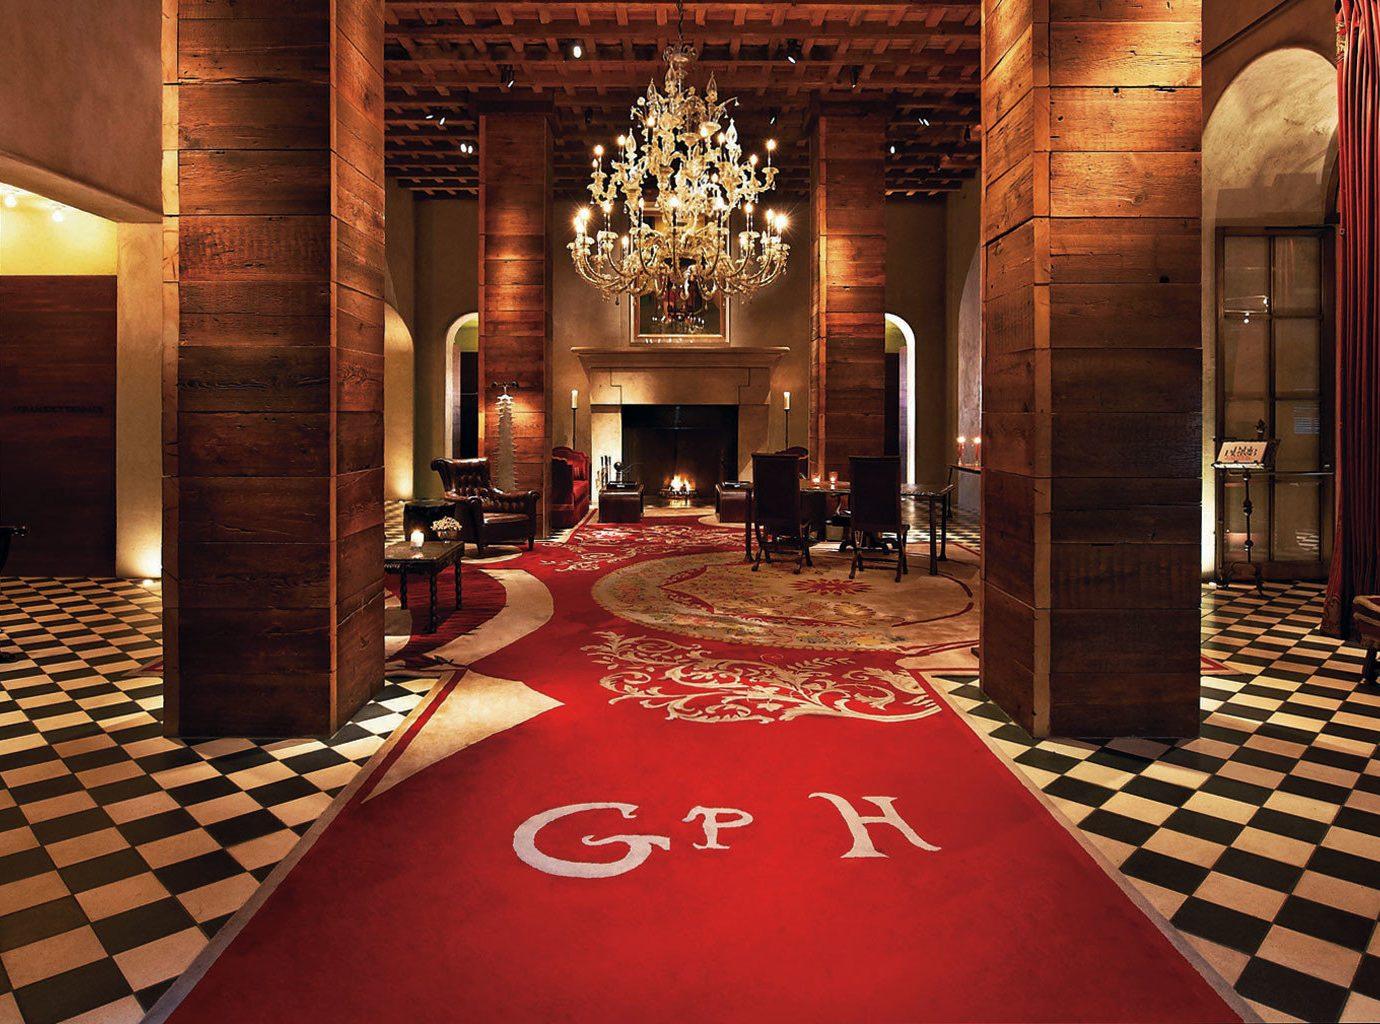 Hotels floor indoor Lobby room aisle red flooring function hall interior design estate ballroom furniture